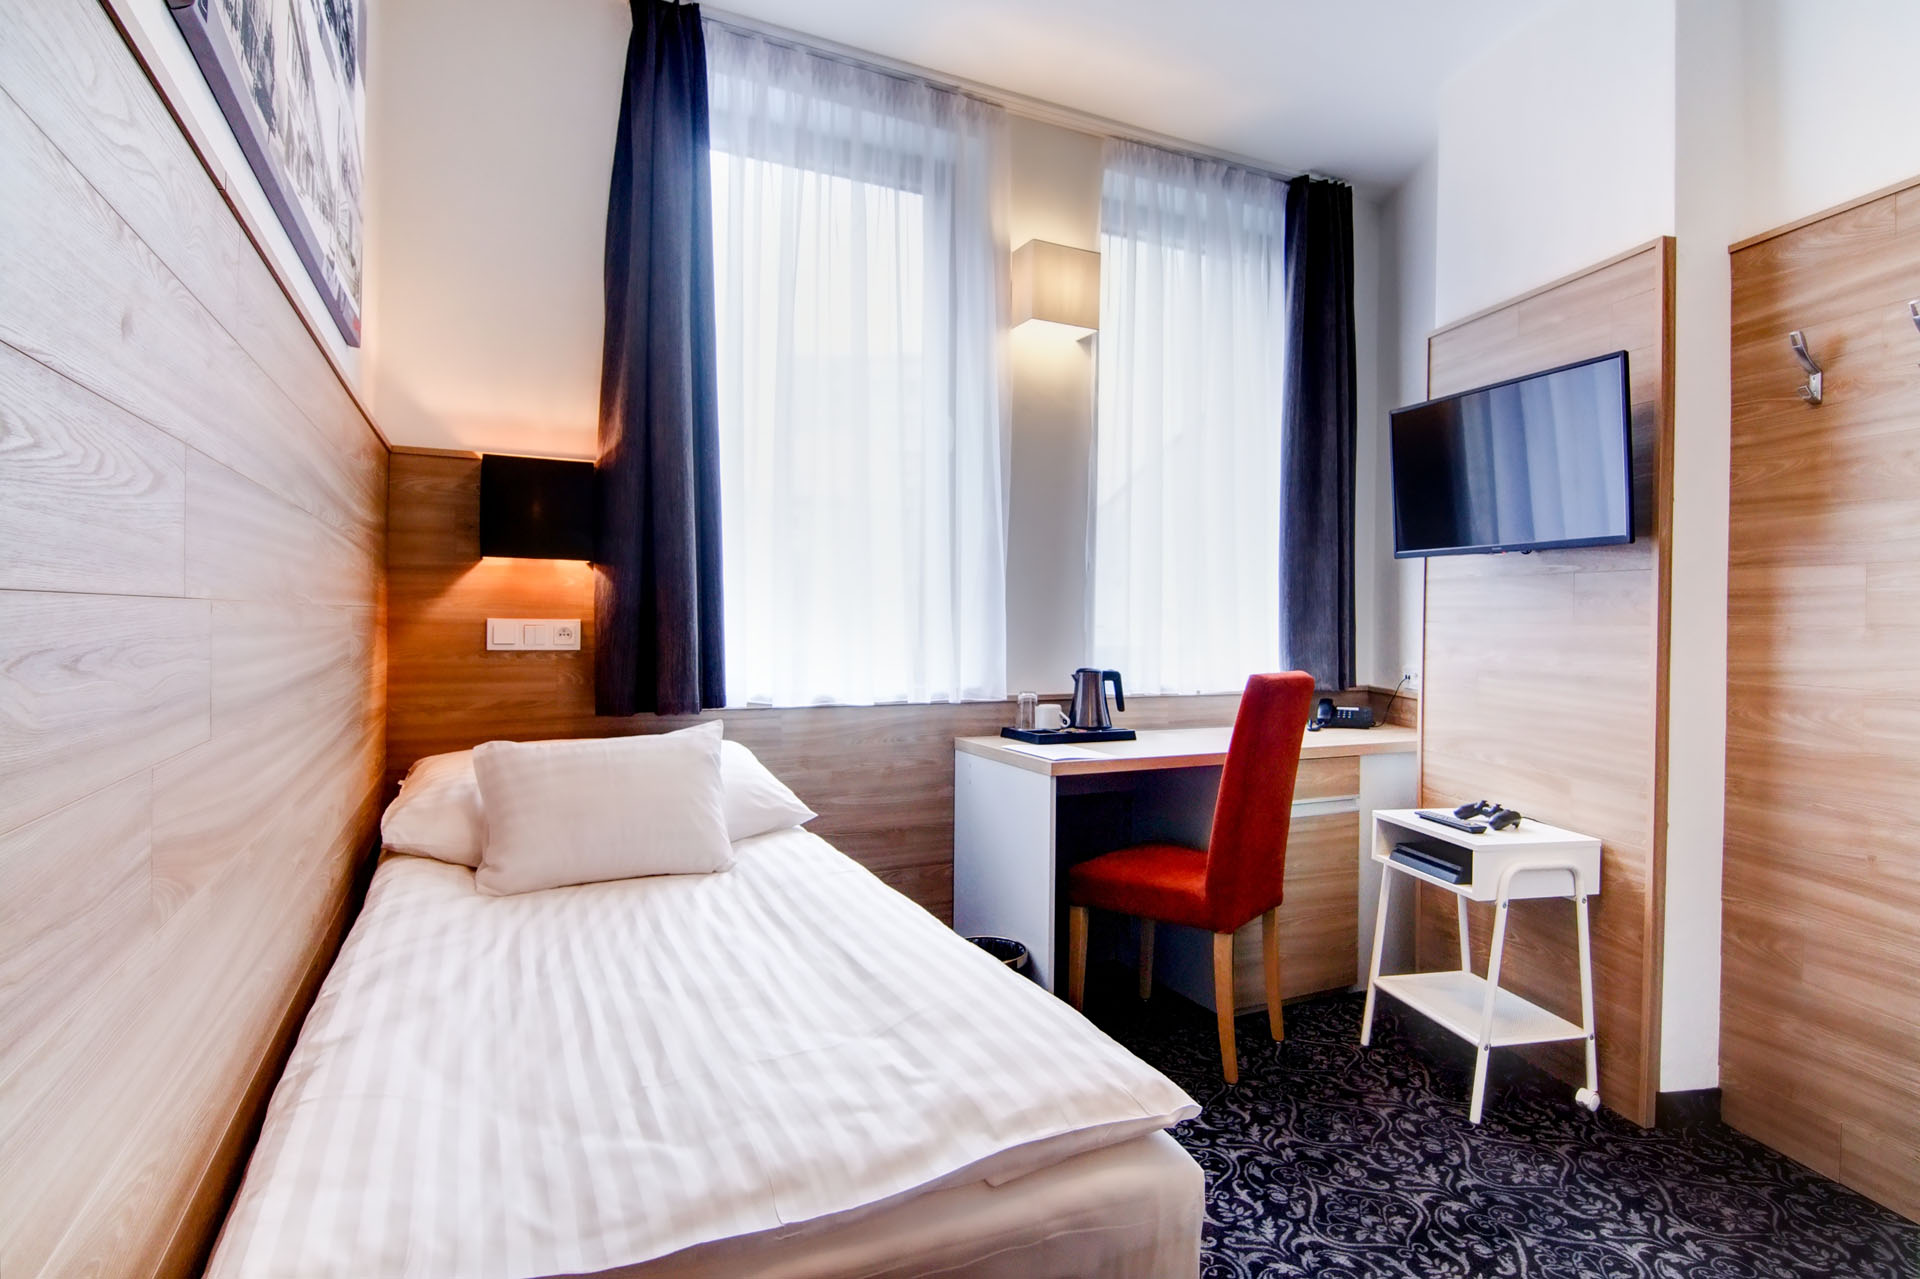 Hotel_Koflik_Strakonice_20190503_0014_